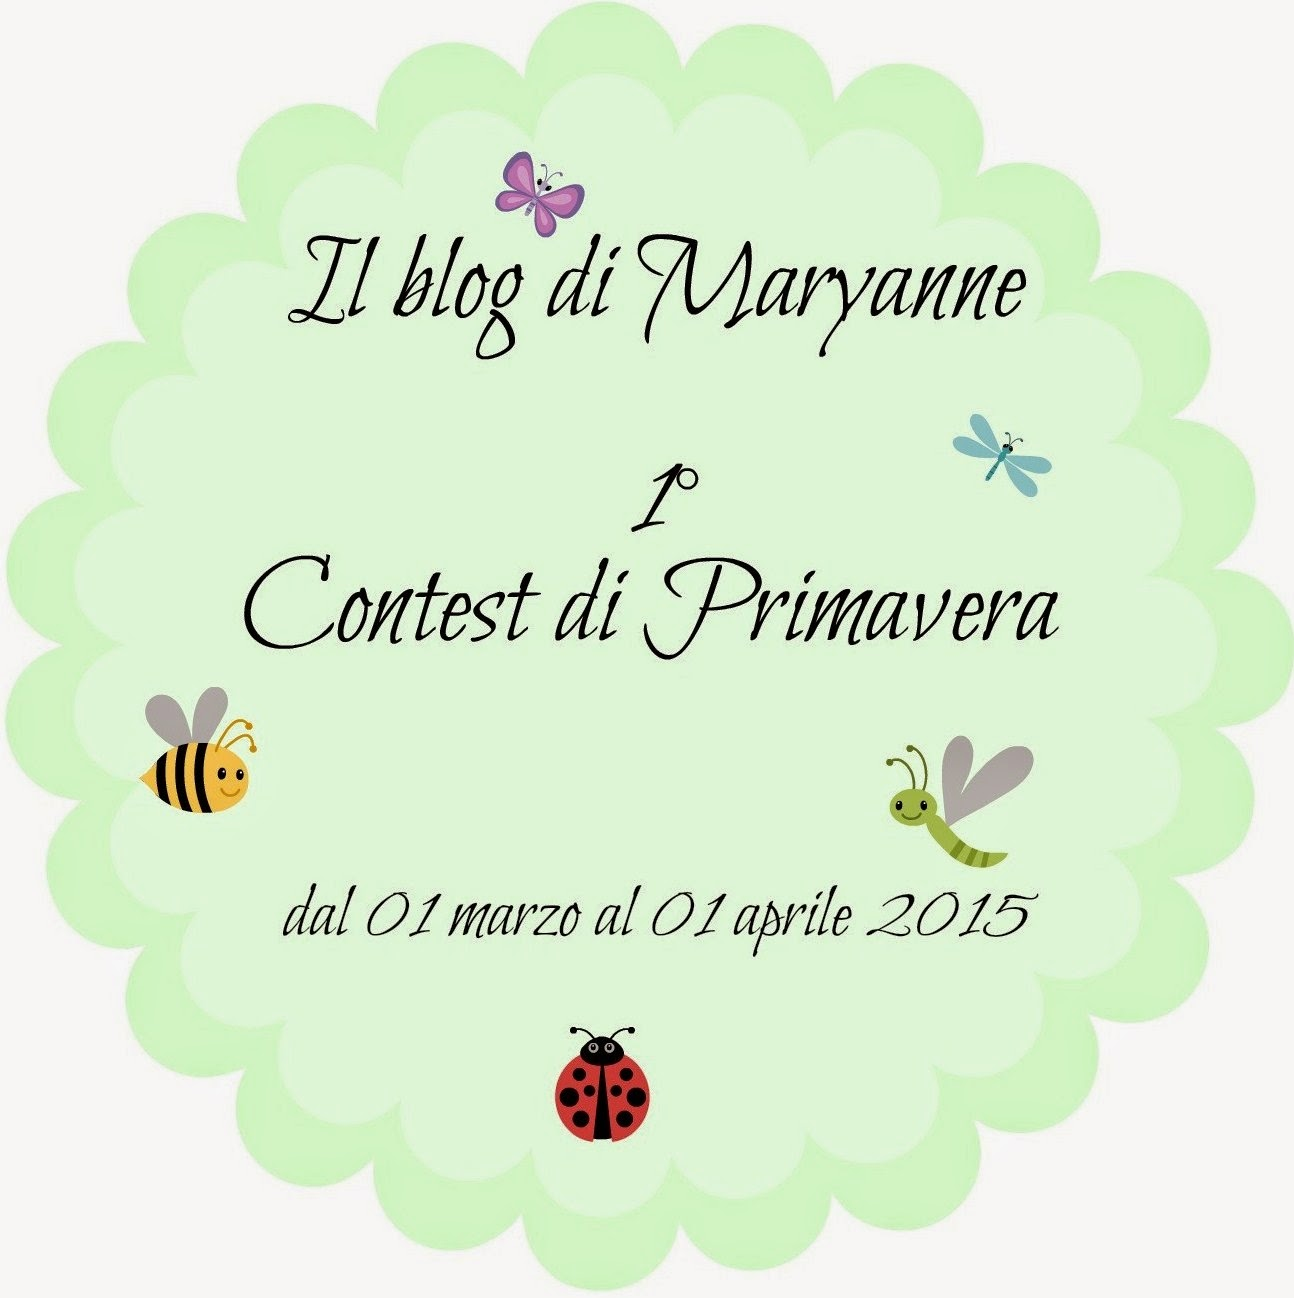 http://sadioni.blogspot.com/2015/03/contest-di-primavera-1.html